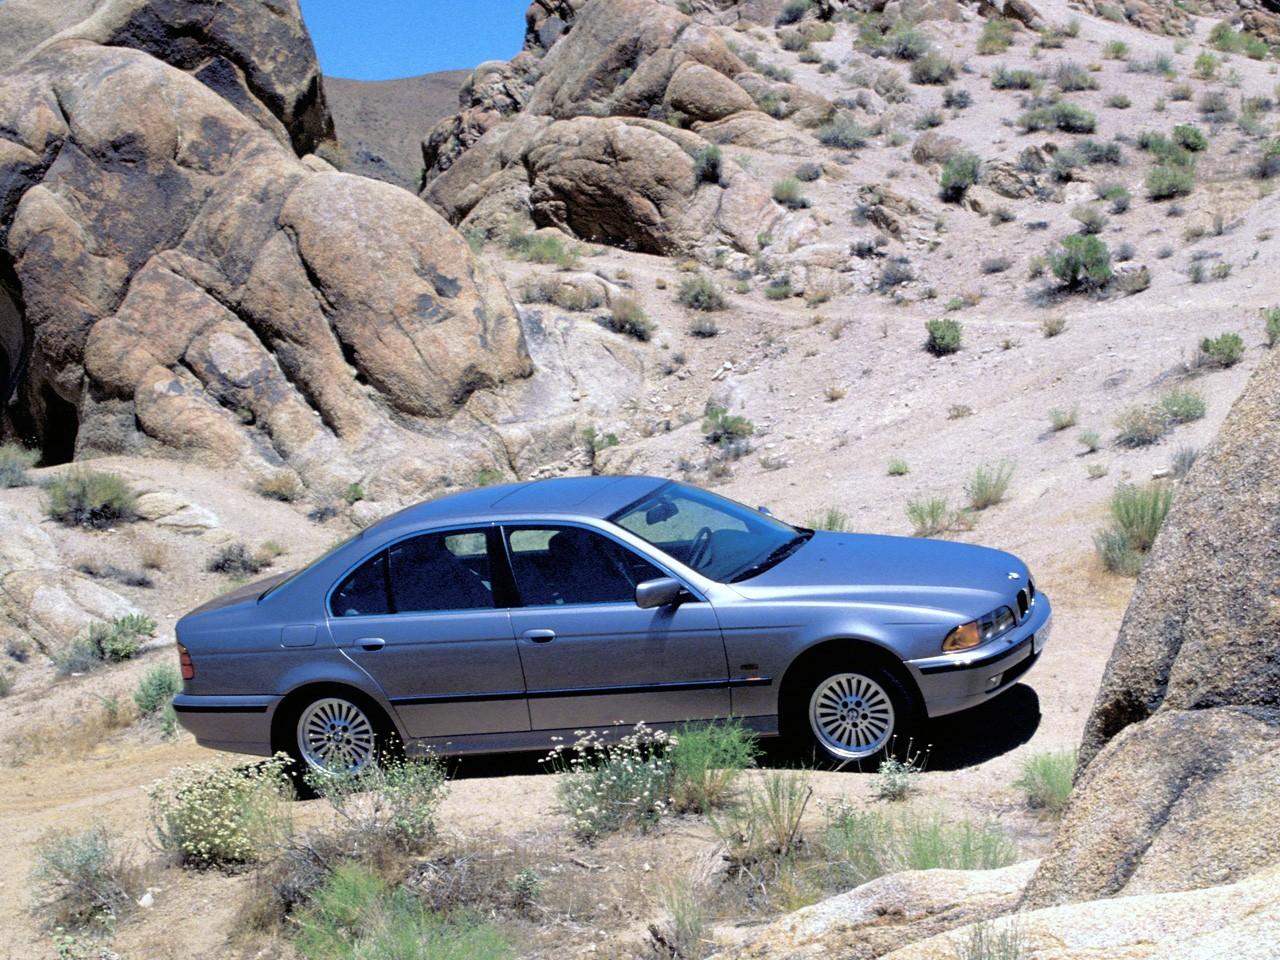 ... BMW 5 Series (E39) (1995 - 2000) ...